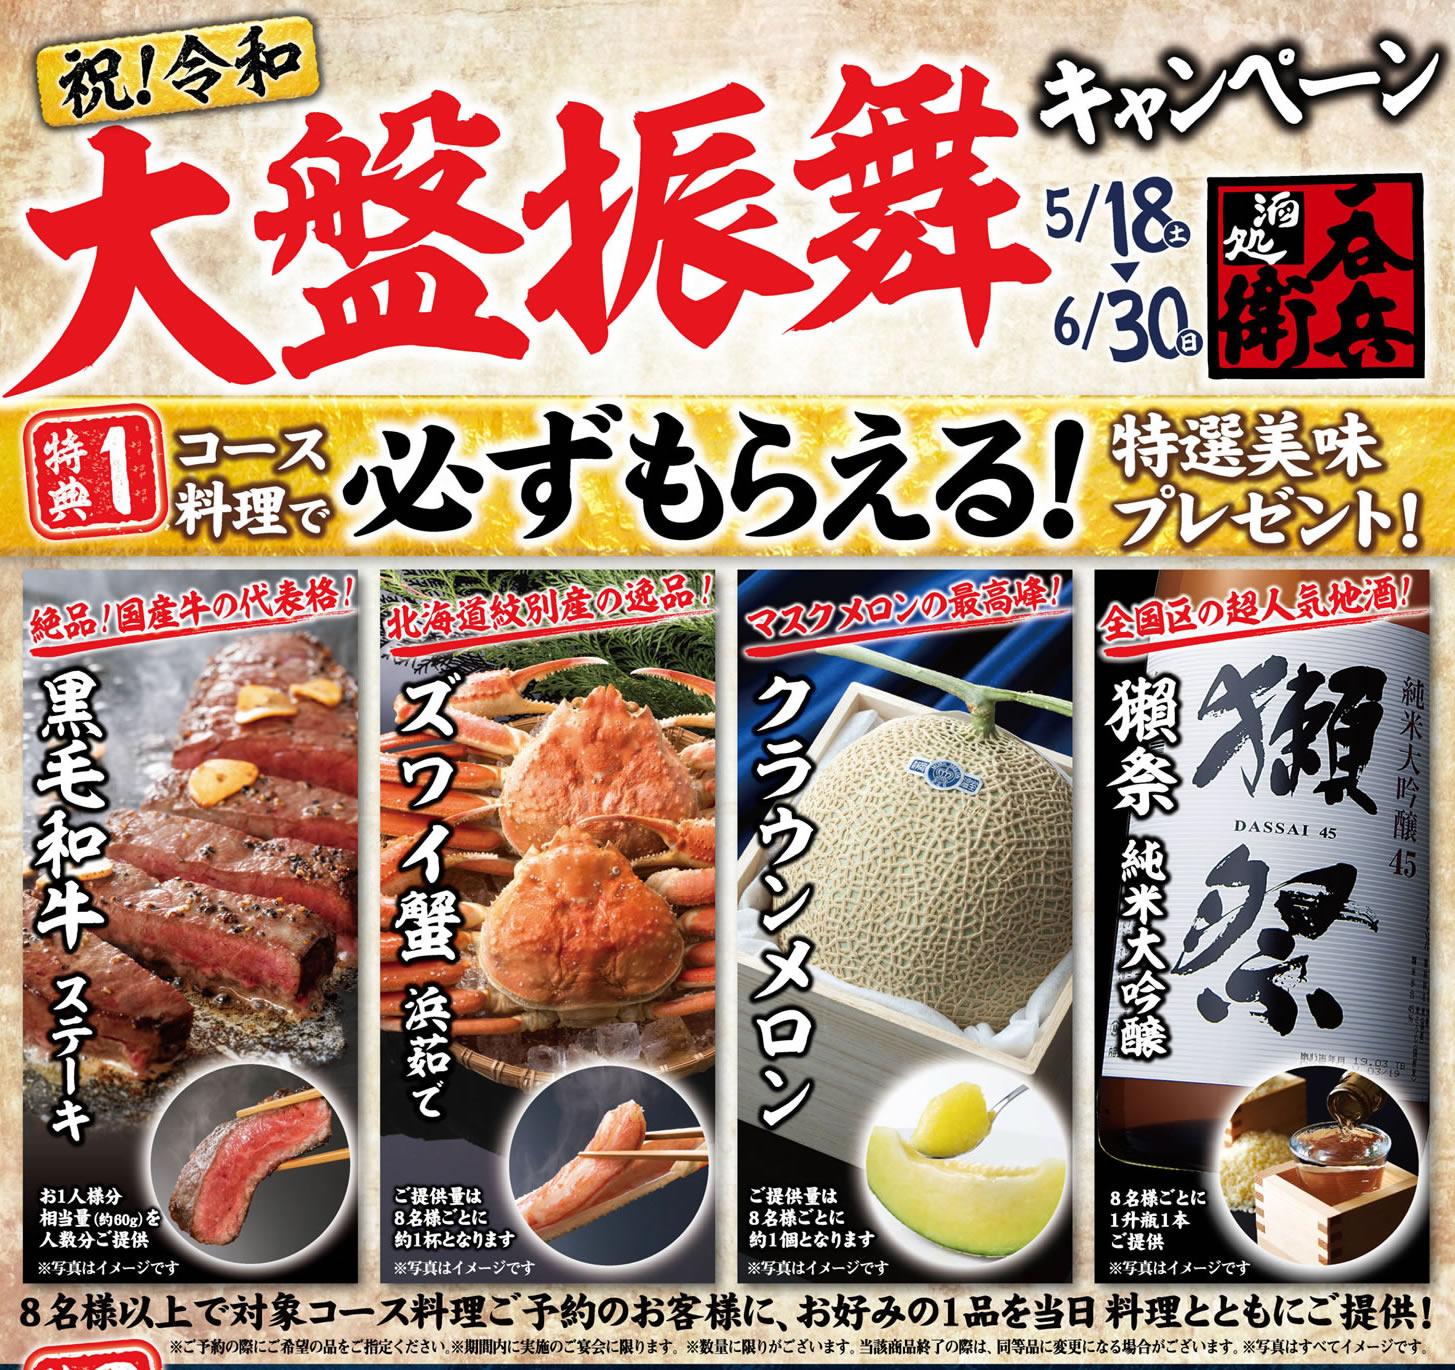 【呑兵衛】新元号「令和」記念! 大盤振舞キャンペーン!!